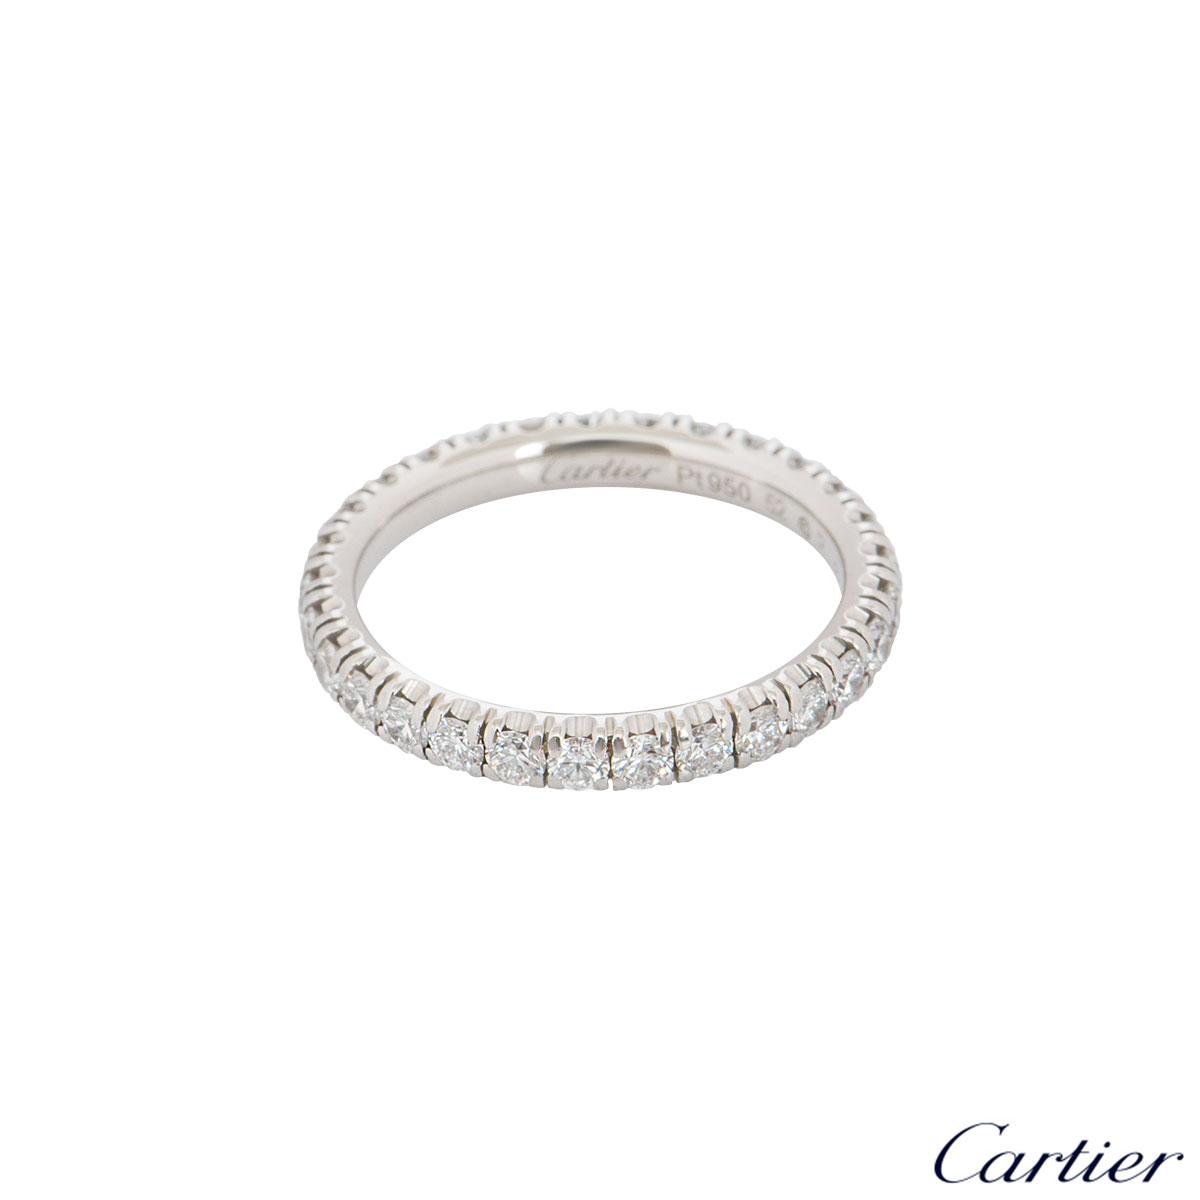 Cartier Platinum Diamond Étincelle De Cartier Ring B4087152